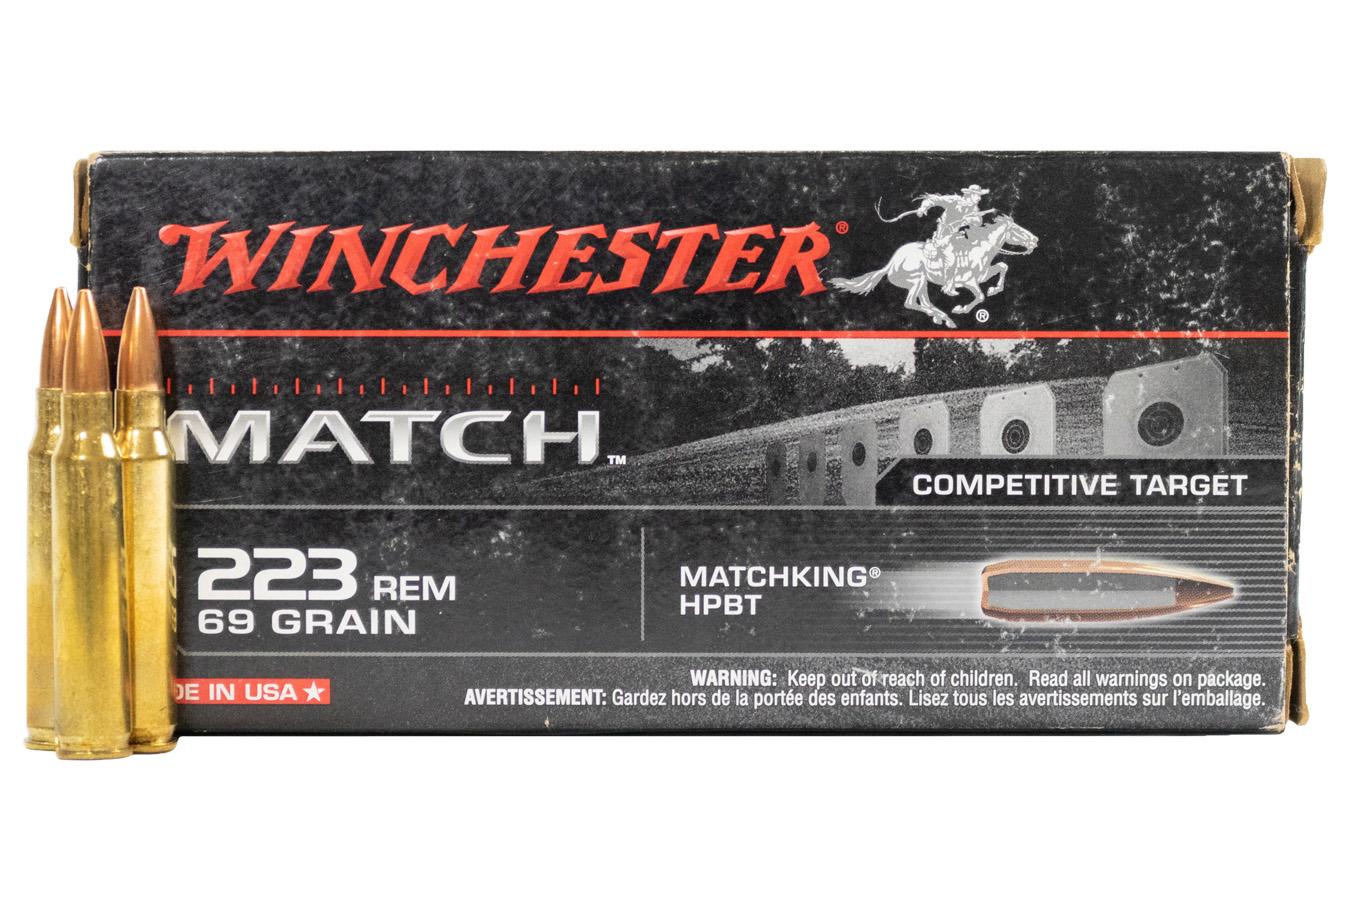 winchester 223 rem 69 gr matchking hpbt competitive target 20 box